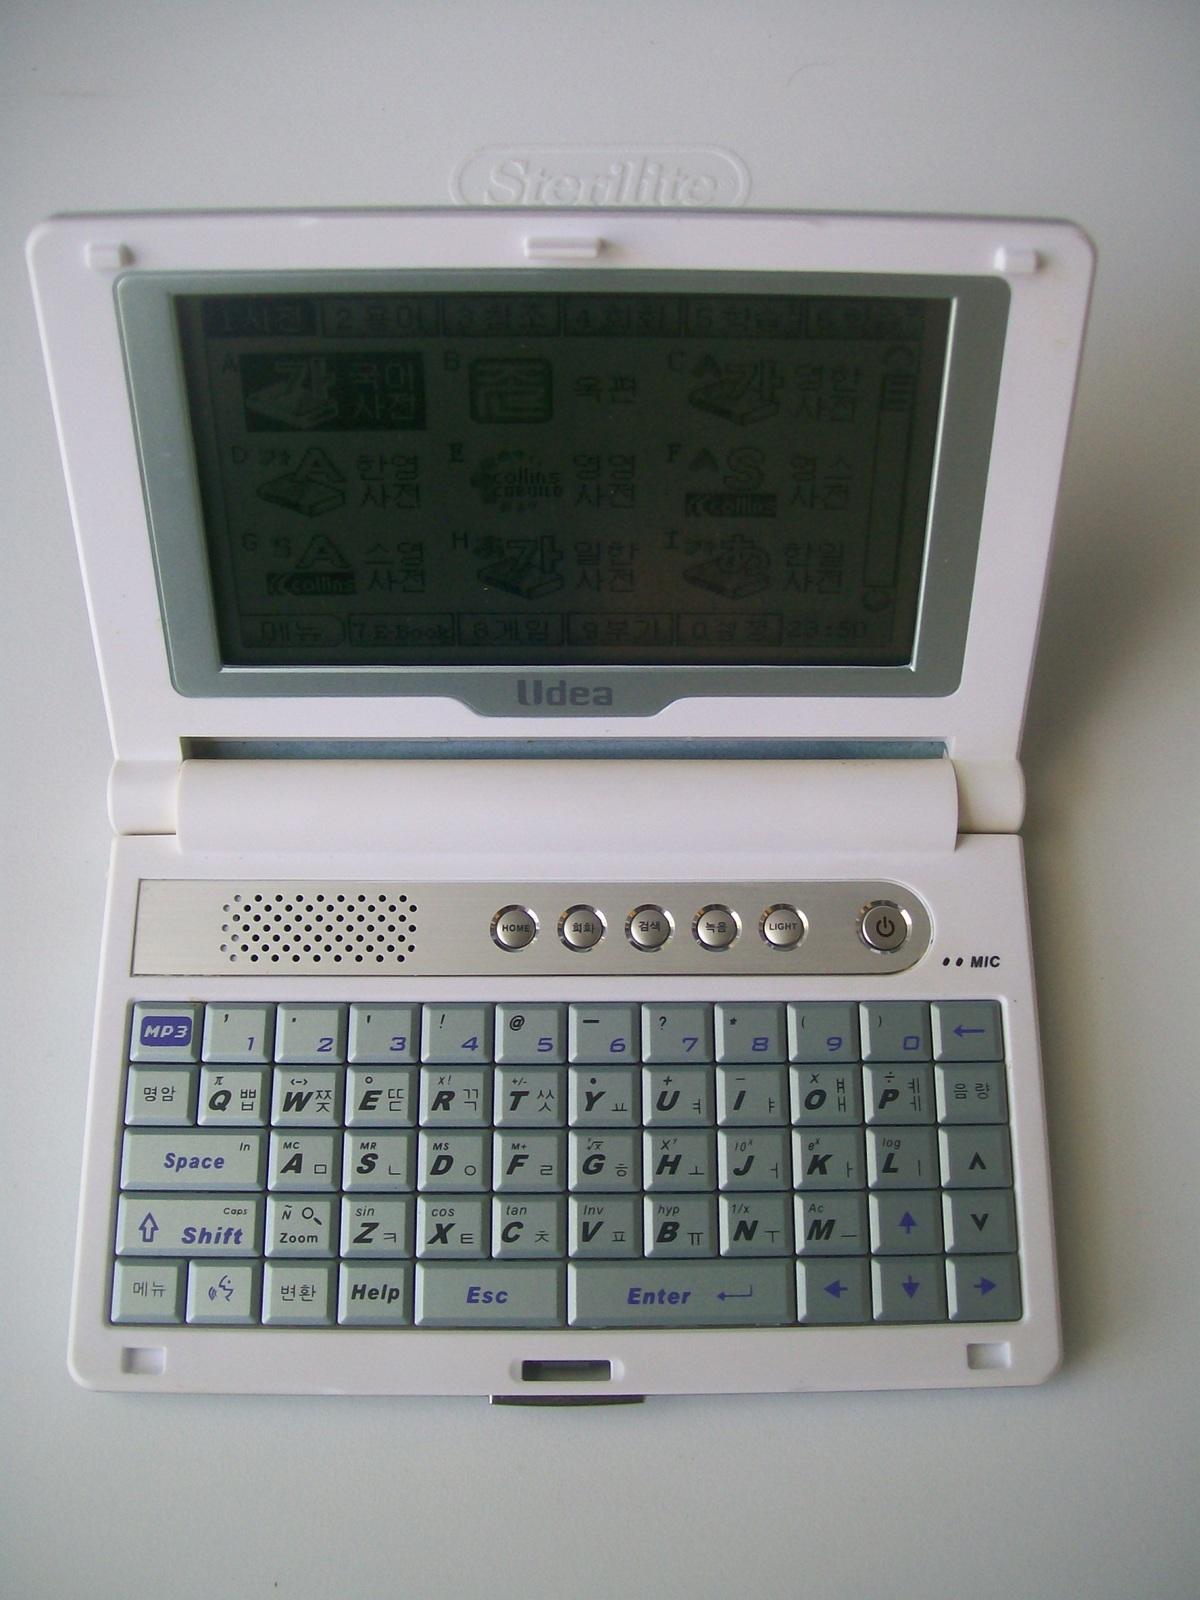 Udea D300 Electronic Dictionary Korean and 50 similar items